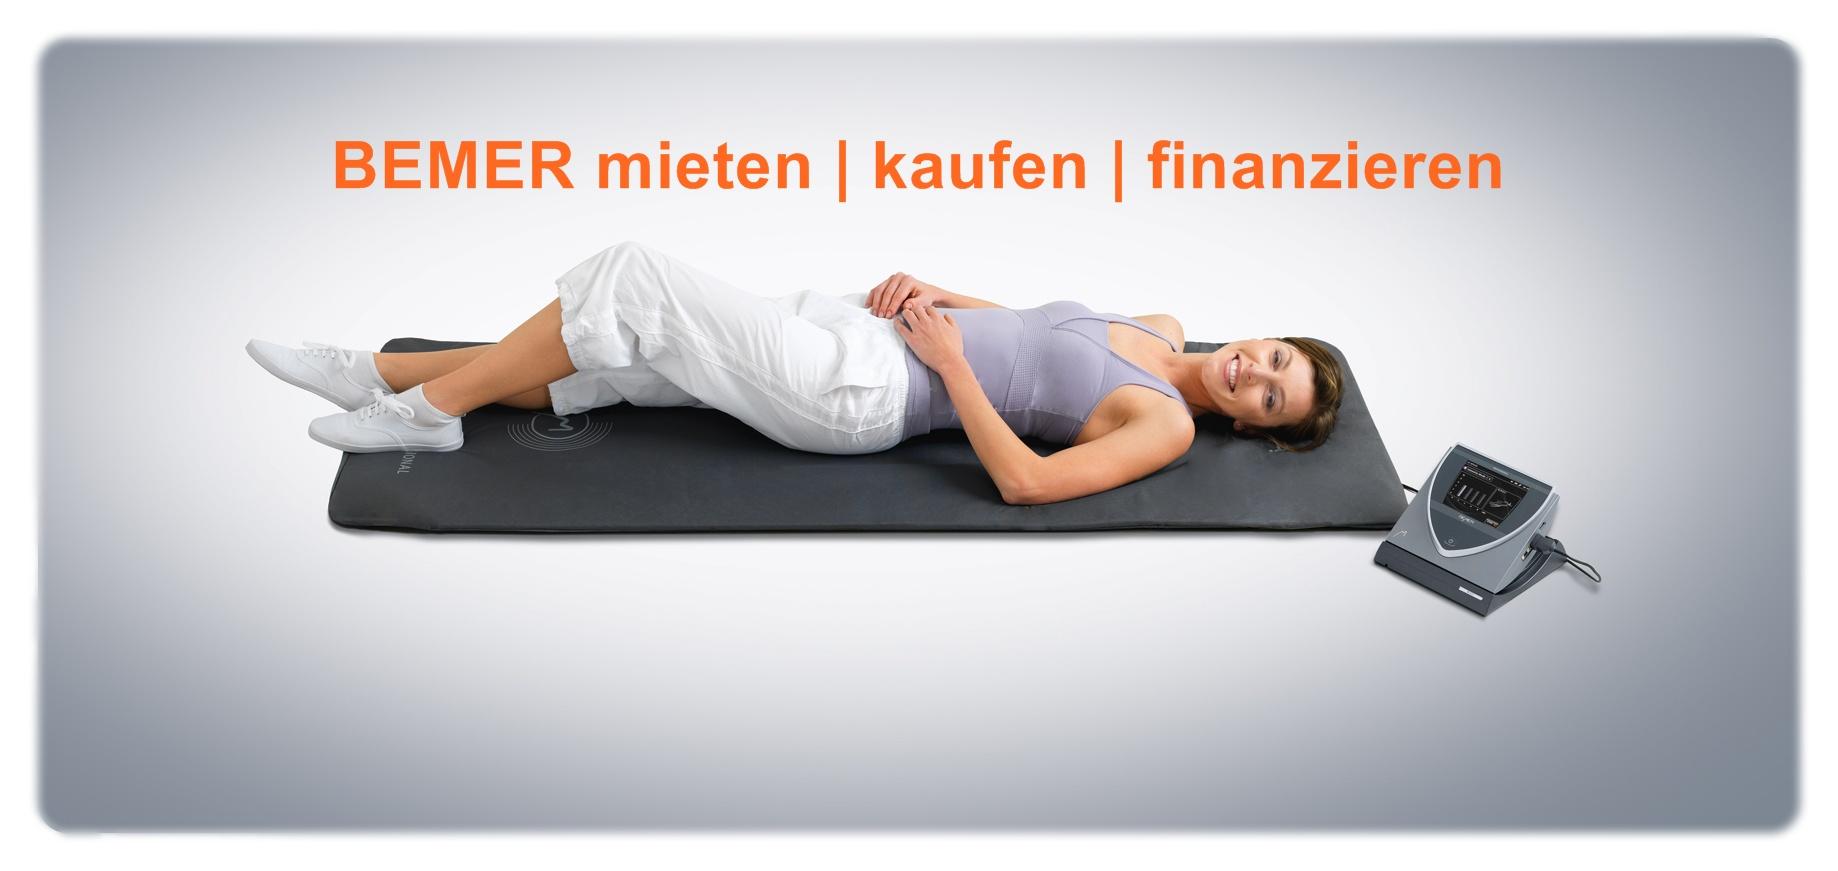 Eleteroforras_Centrum_BEMER_terapia_BEMER_Therapie_mieten_kaufen_finanzieren